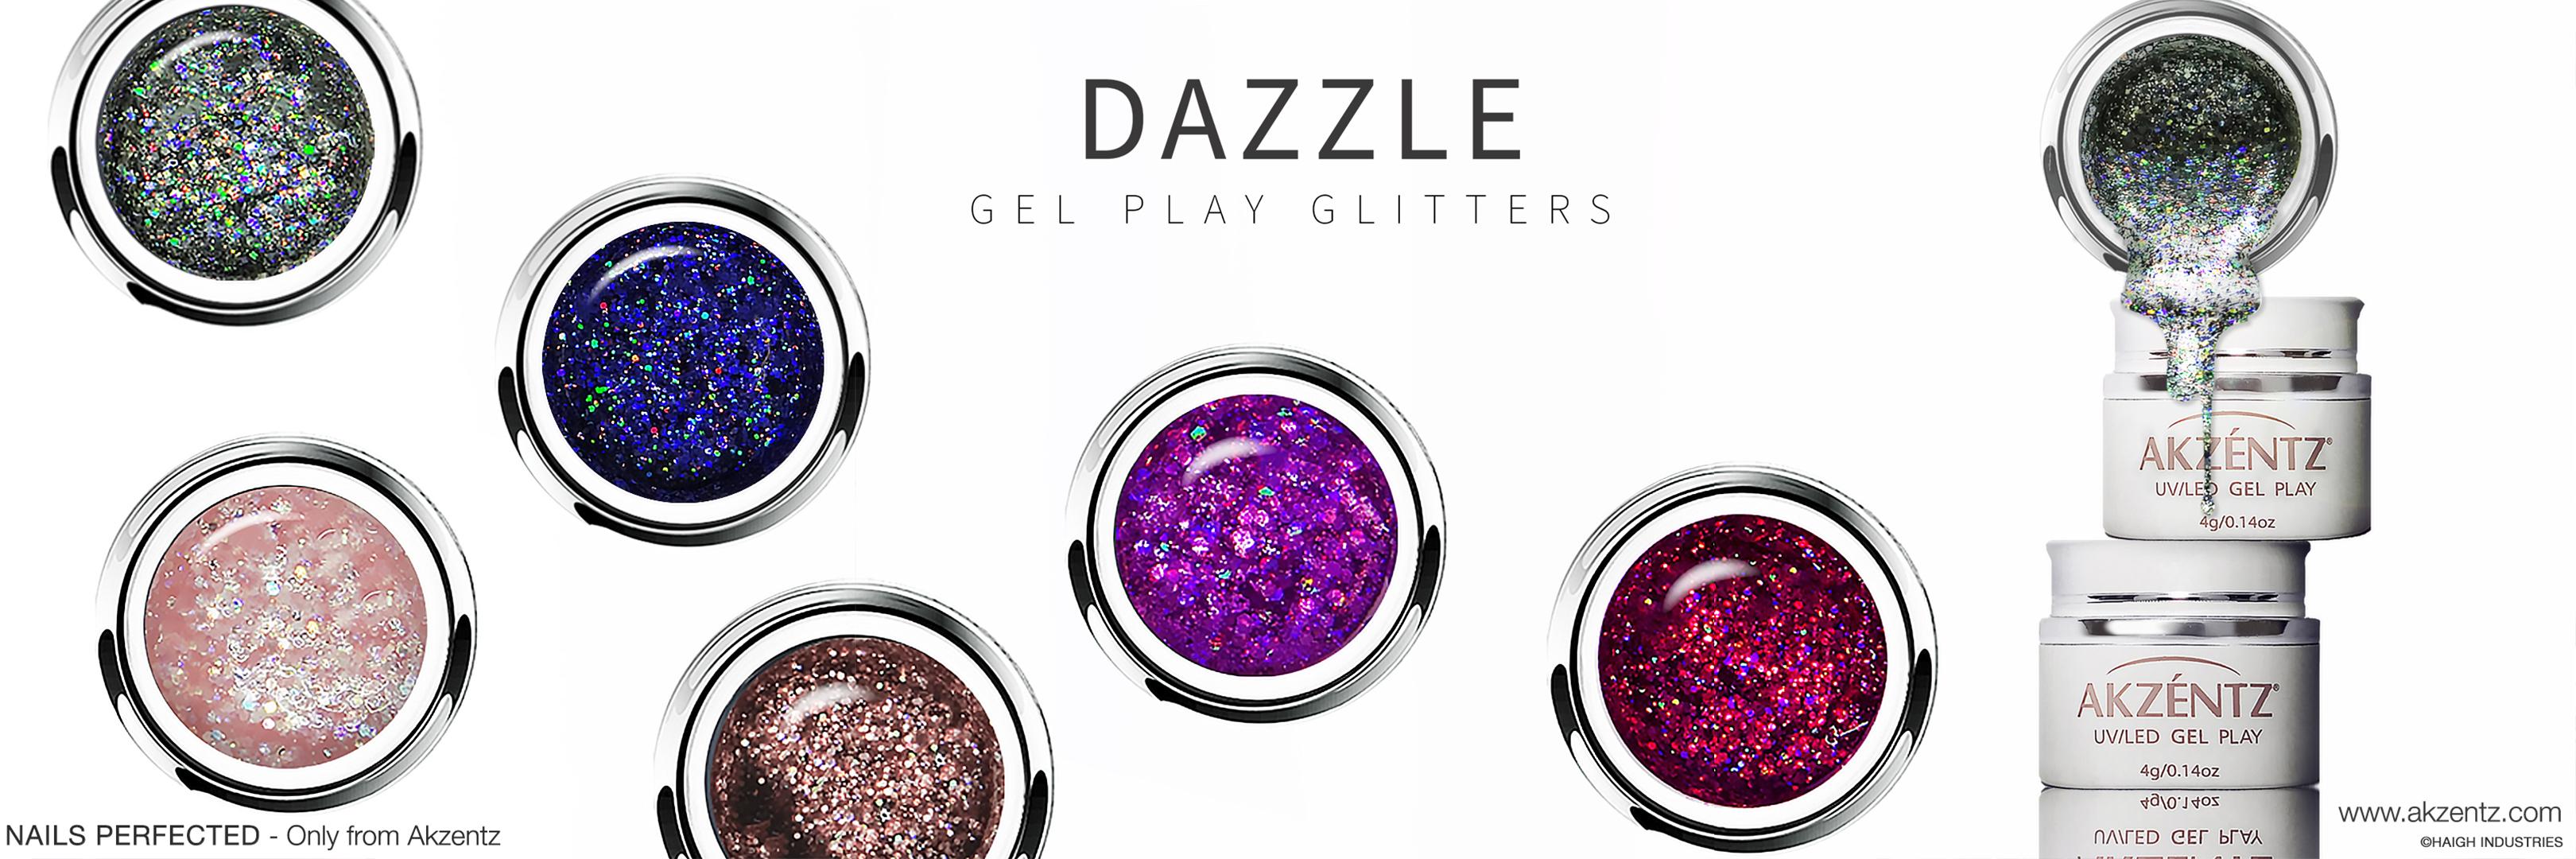 dazzle-gel-play-akzentz.jpg